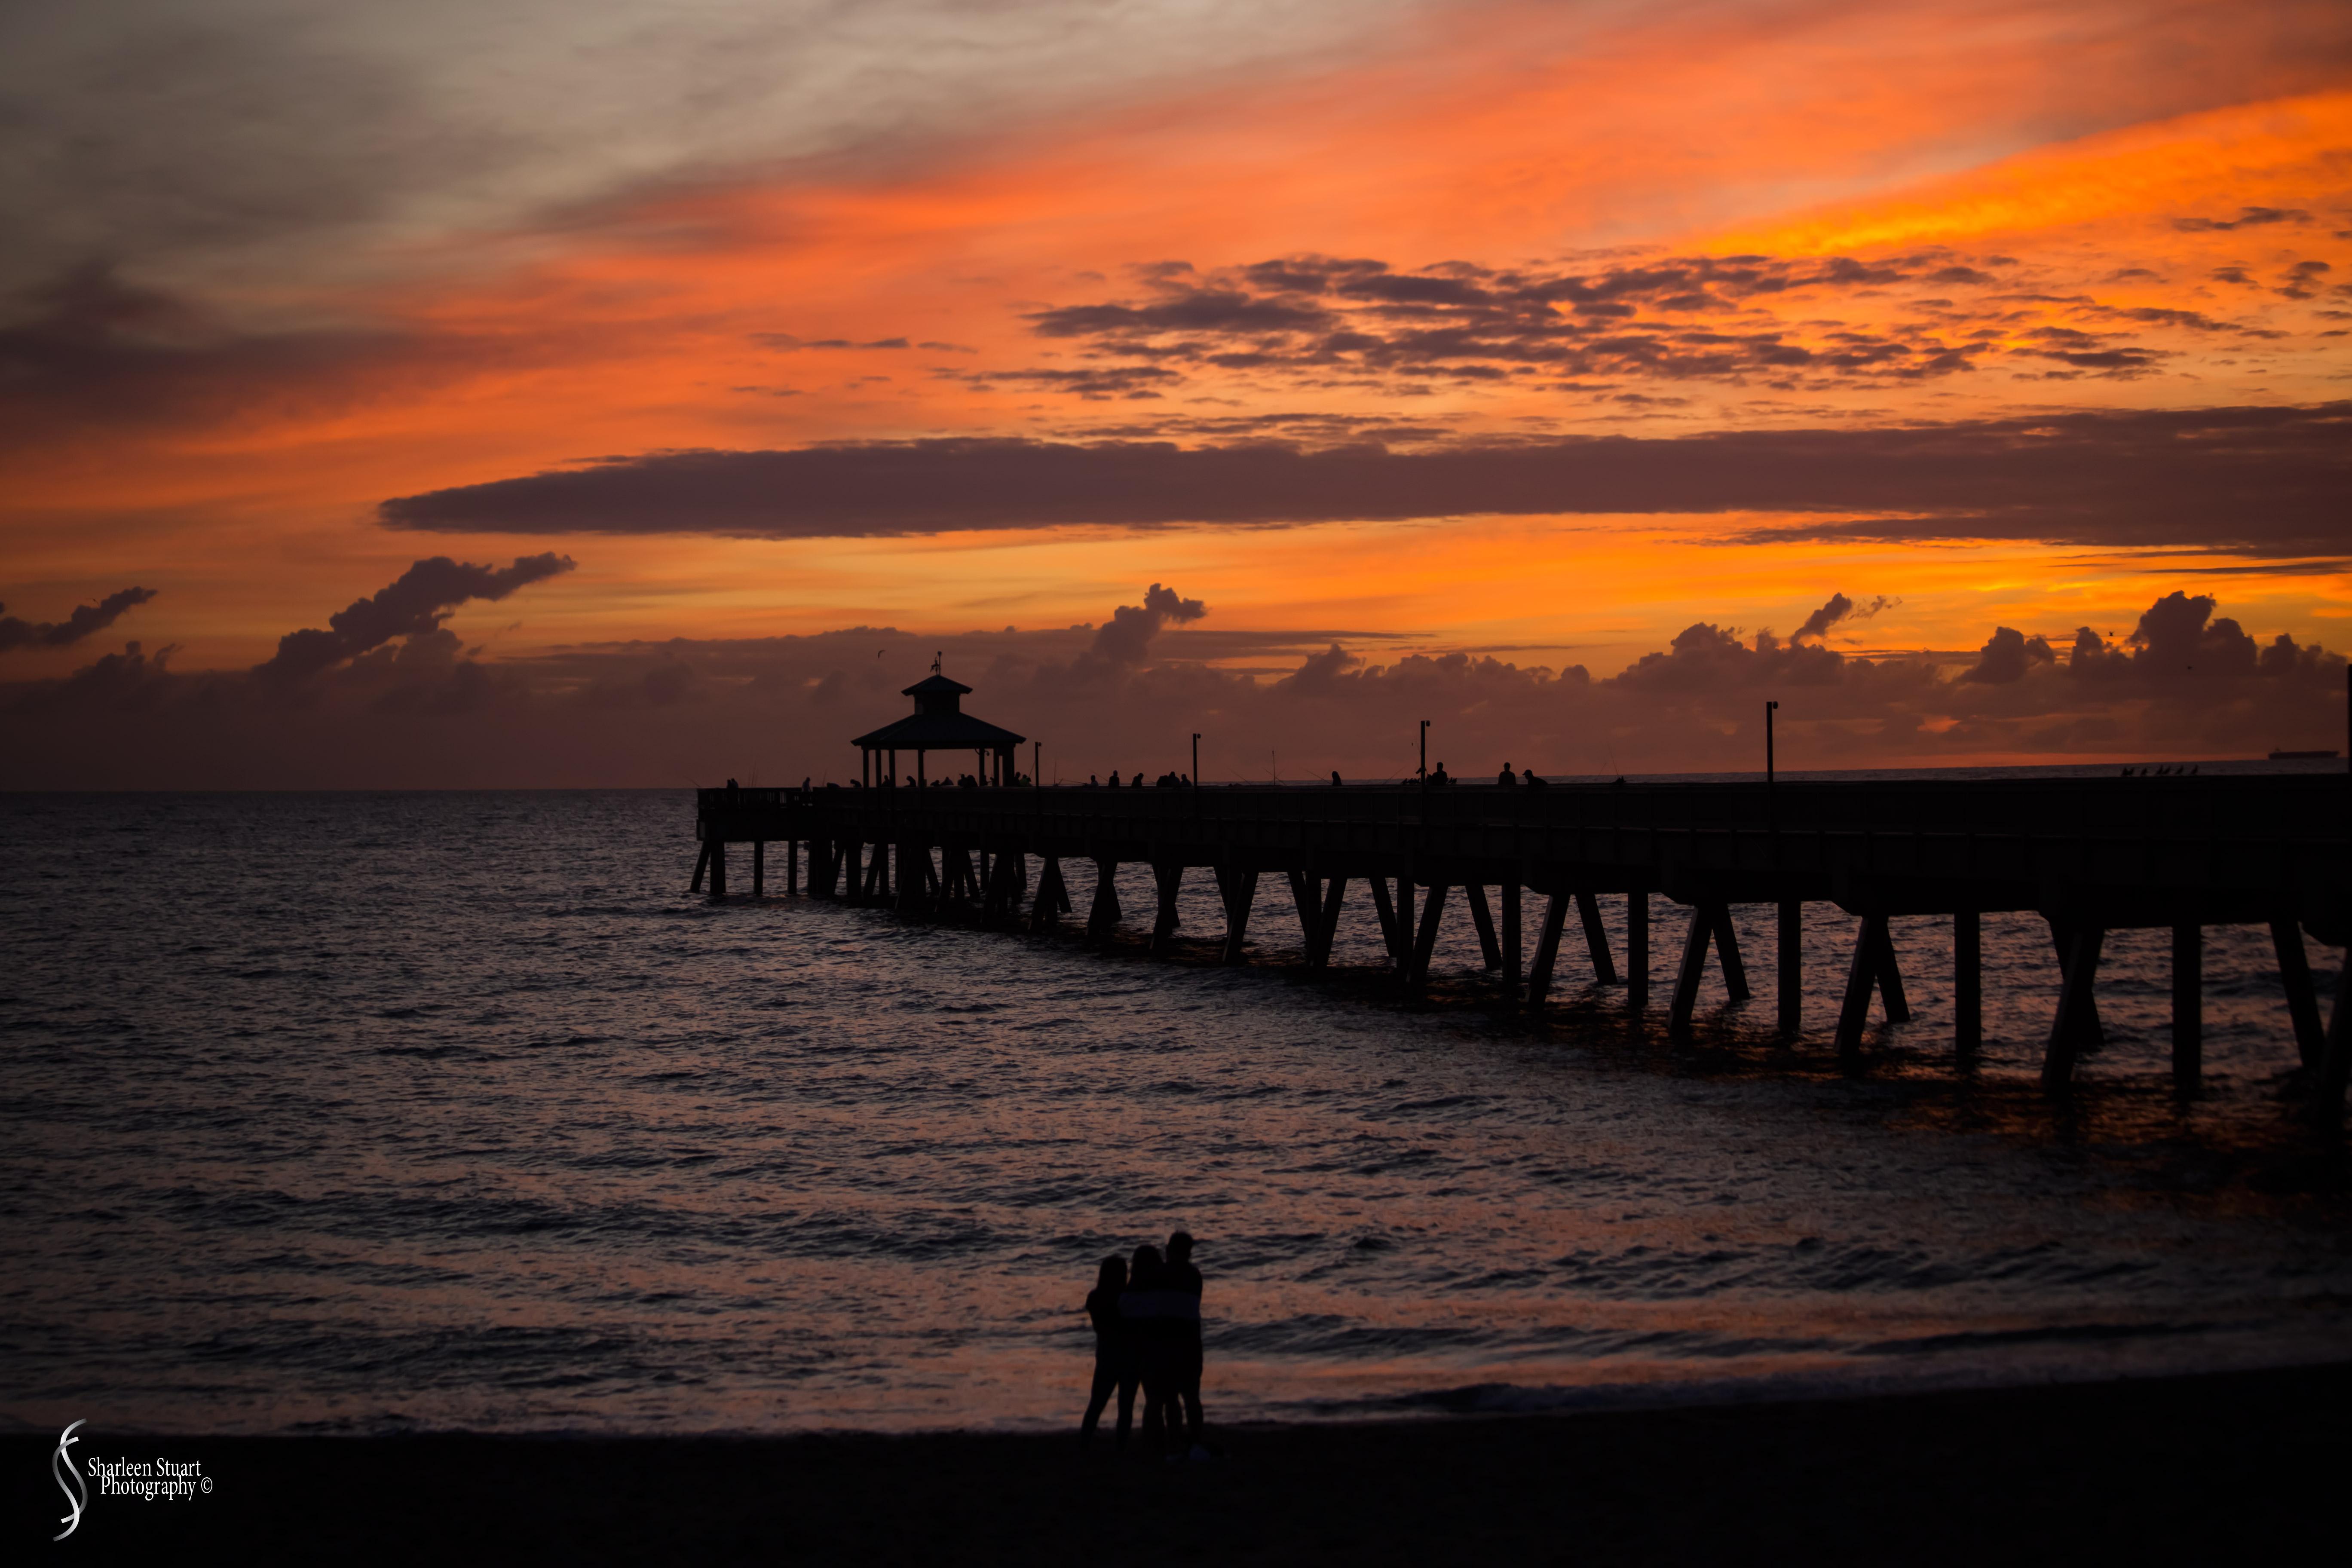 Deerfield Beach: Day before Hurricane Dorian: Nov 24, 2019: 8336